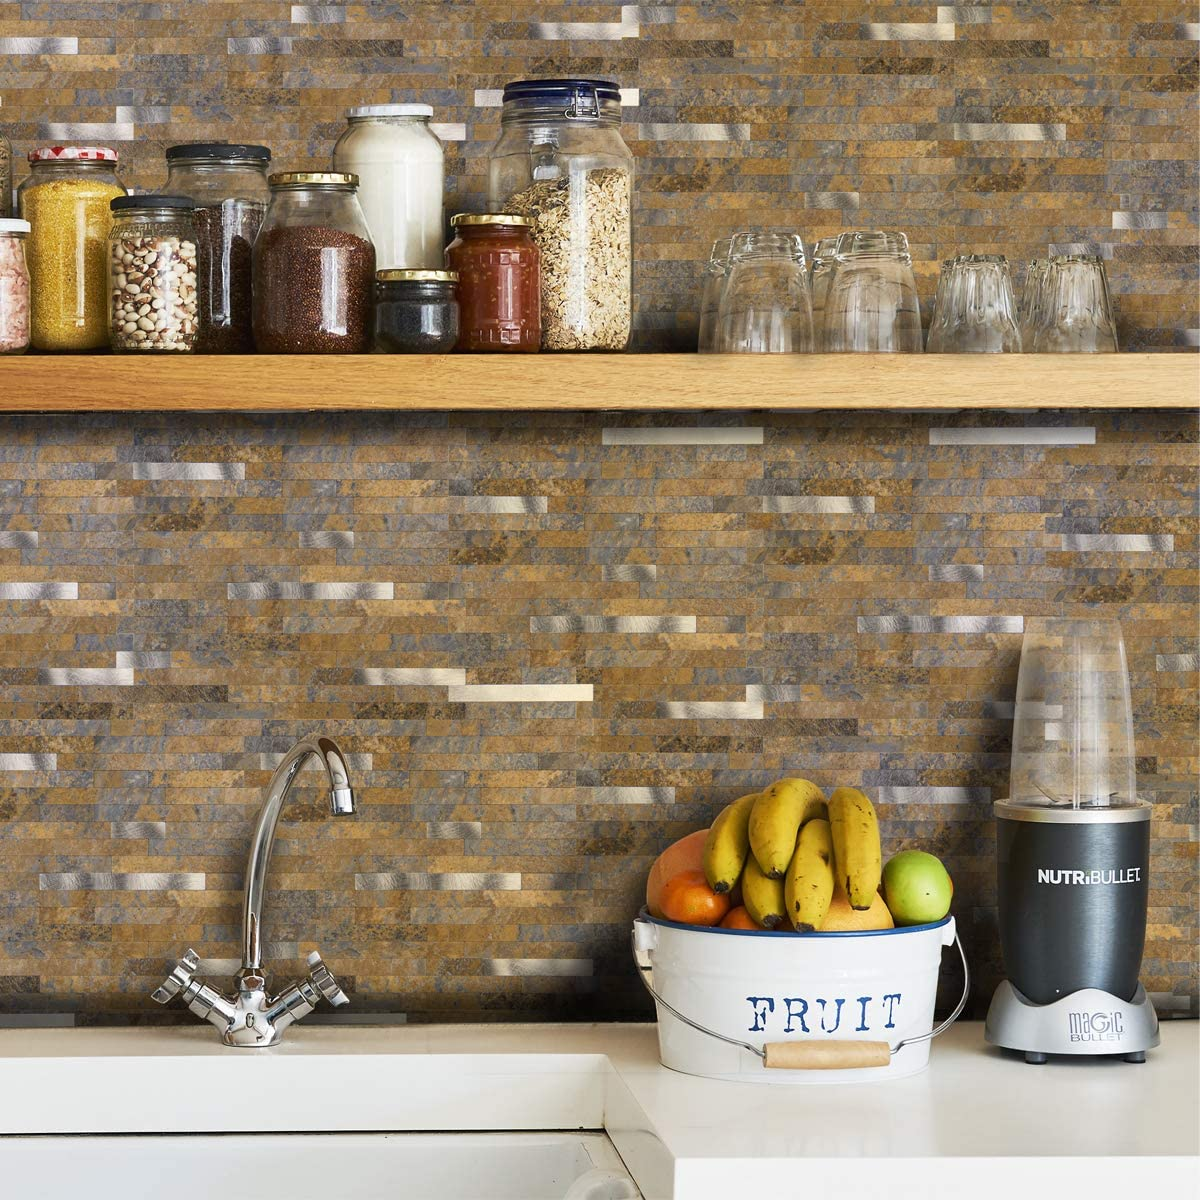 A16615-Art3d 10-Sheet Peel and Stick Stone Backsplash Tile for Kitchen, Bathroom - Volakas White Embellished with Metal Silver